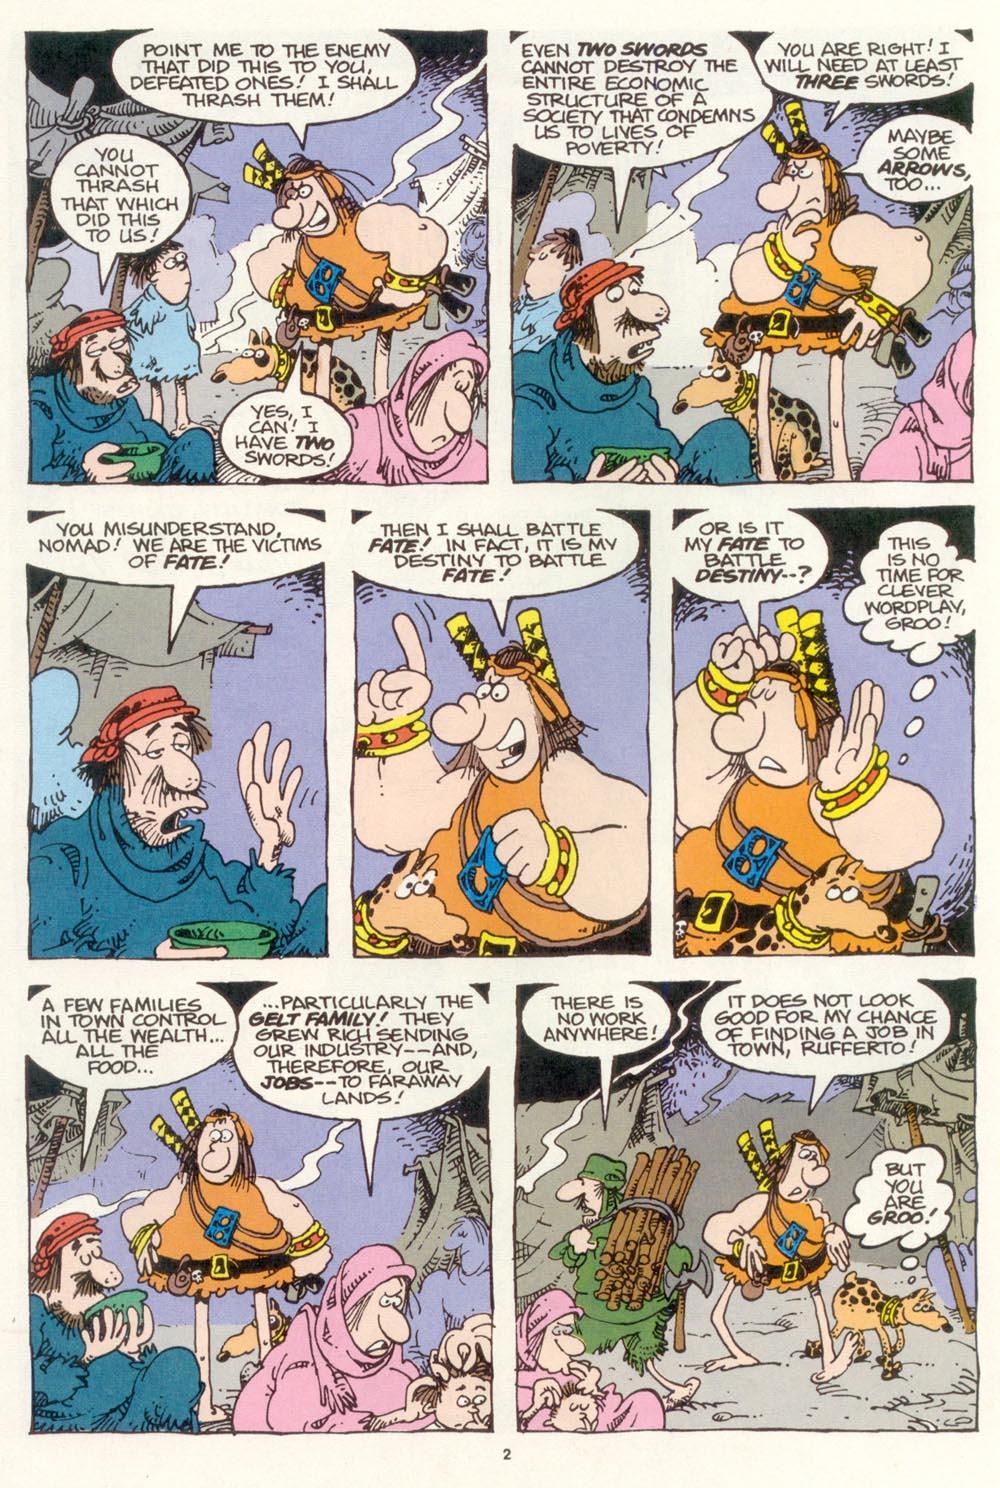 Read online Sergio Aragonés Groo the Wanderer comic -  Issue #118 - 4